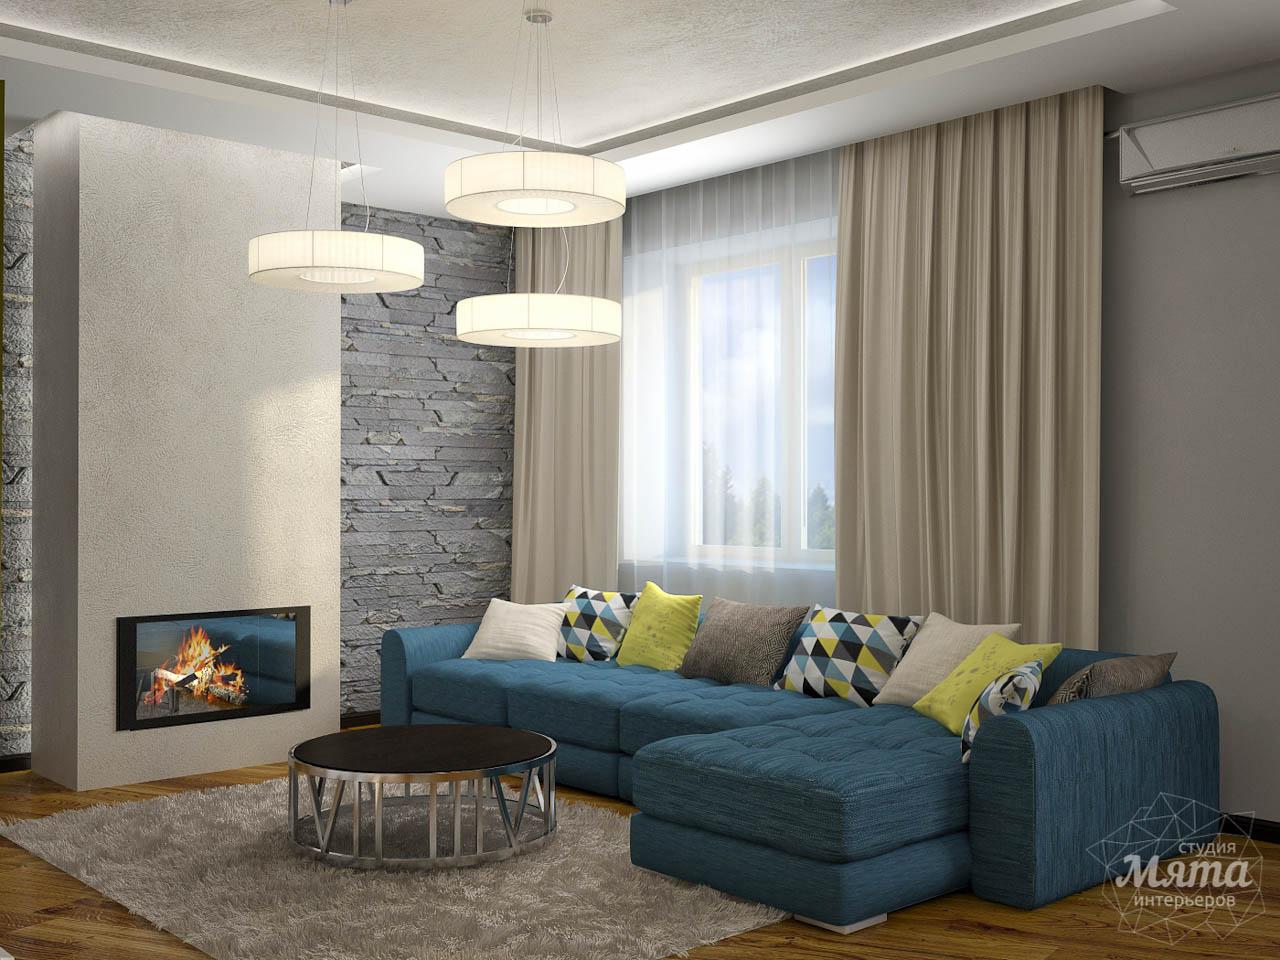 Дизайн проект интерьера коттеджа  в стиле минимализм по ул. Барвинка 15 img1325168599